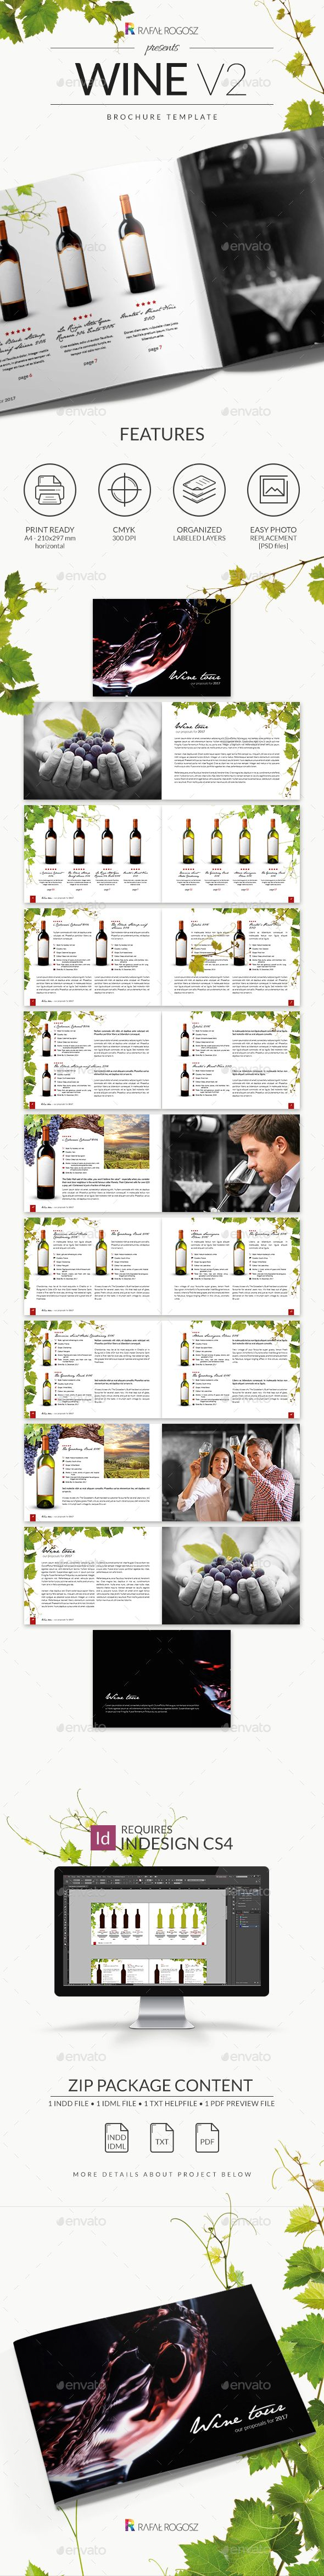 Wine Brochure v2  — PSD Template #landscape #minimalistic • Download ➝ https://graphicriver.net/item/wine-brochure-v2/18632397?ref=pxcr